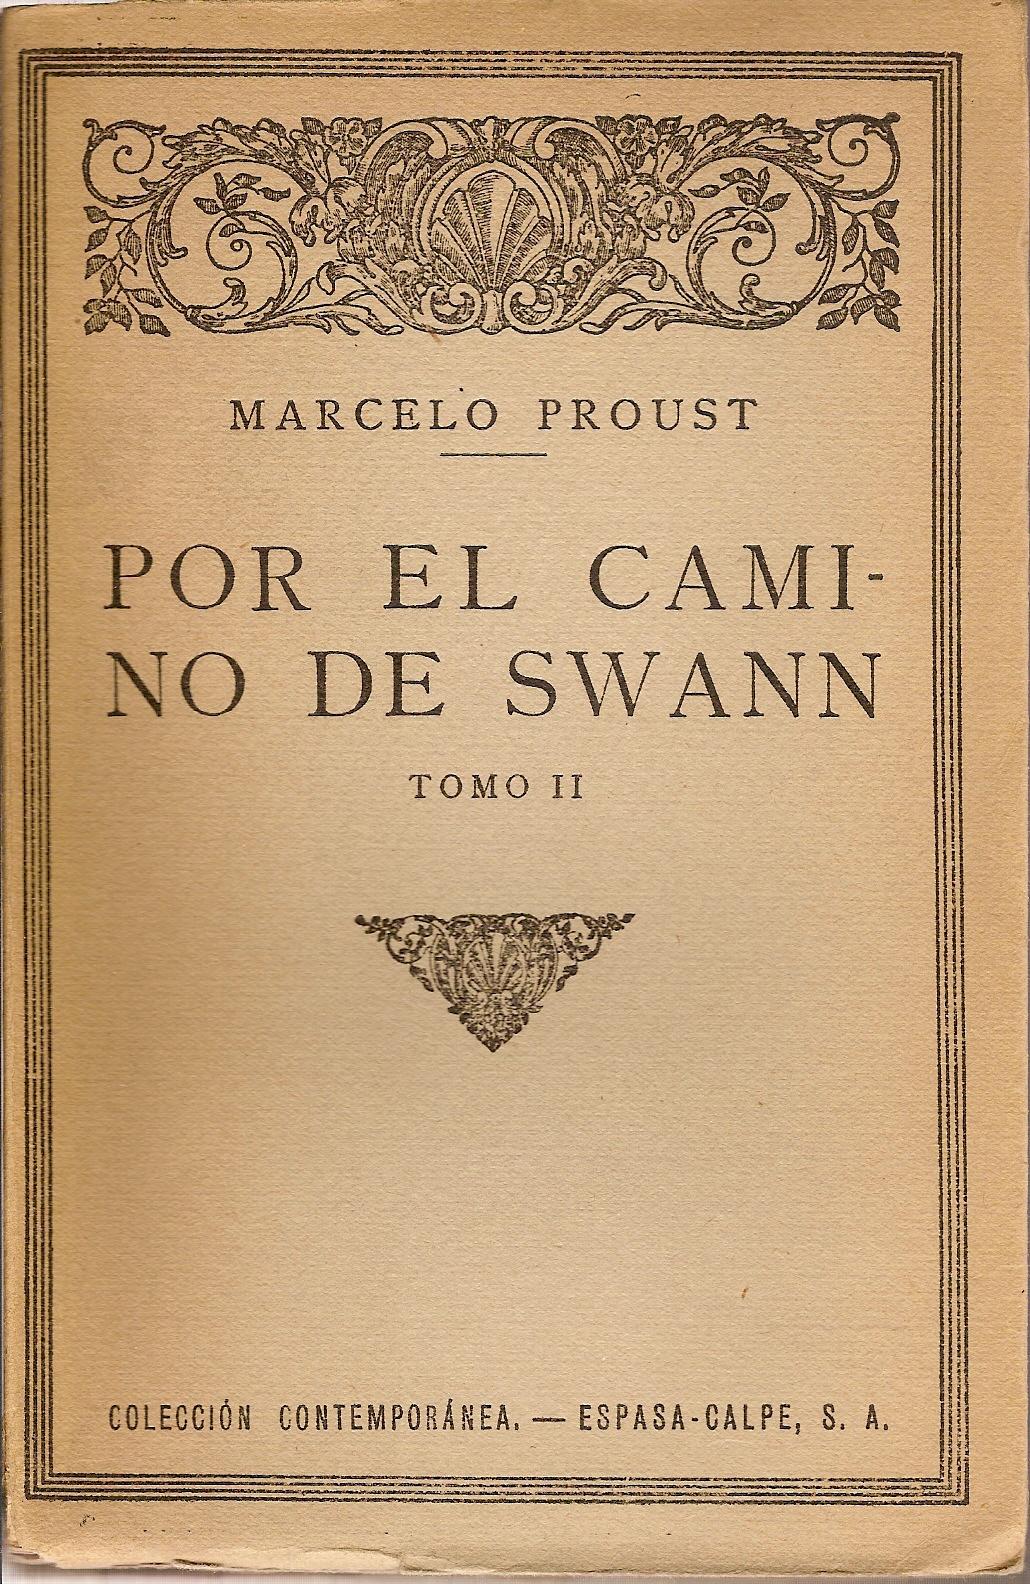 File por el camino de swann espasa calpe1920 for Por el camino de swann